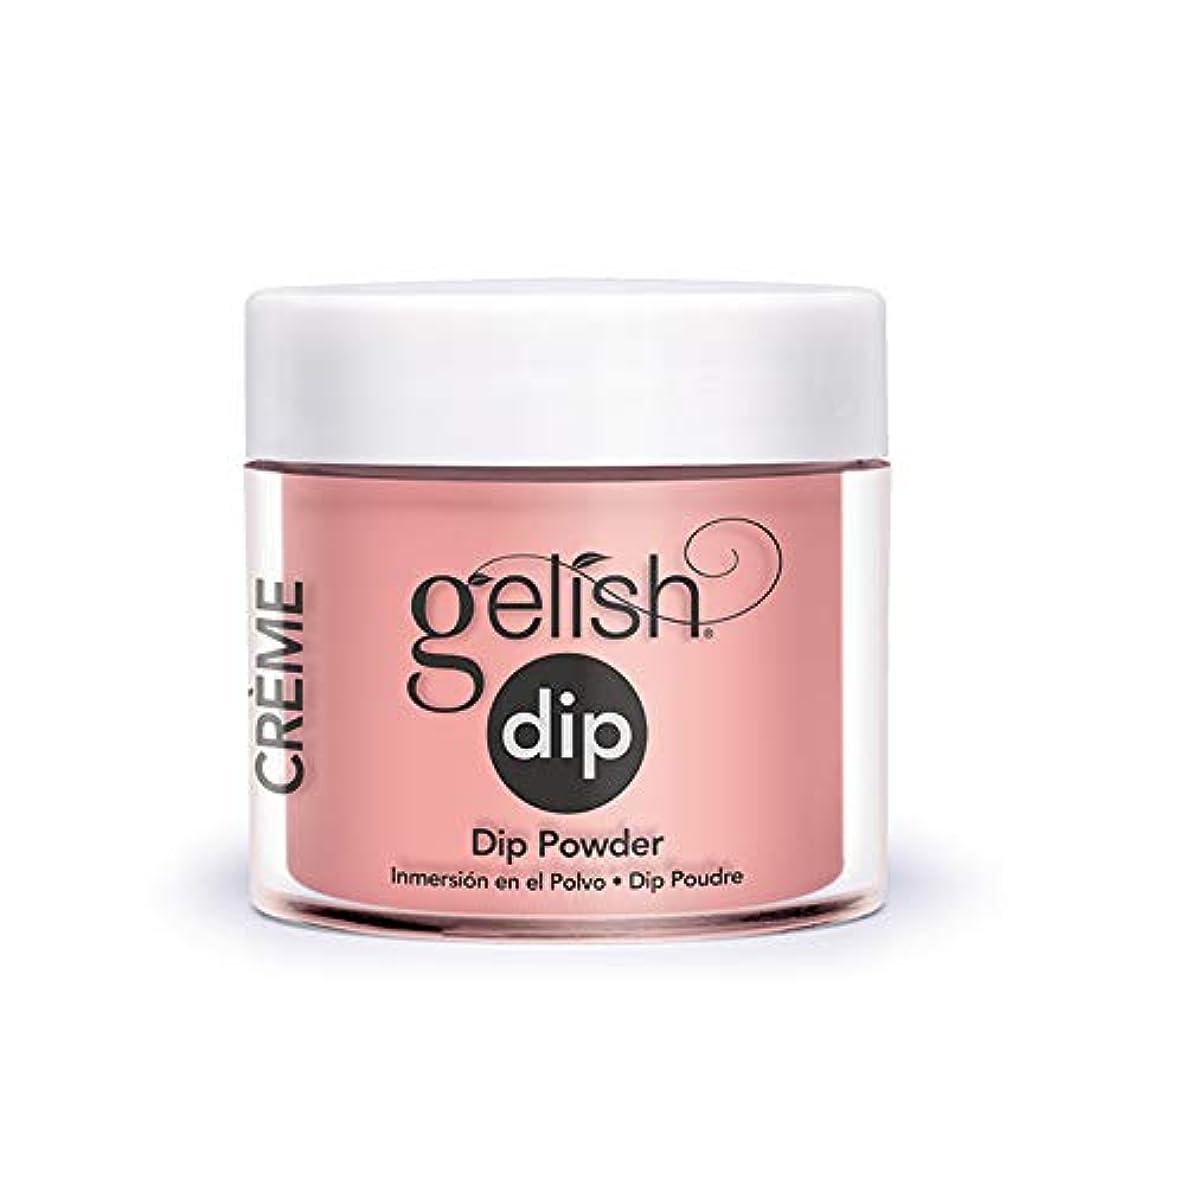 Harmony Gelish - Acrylic Dip Powder - Don't Worry, Be Brilliant - 23g / 0.8oz